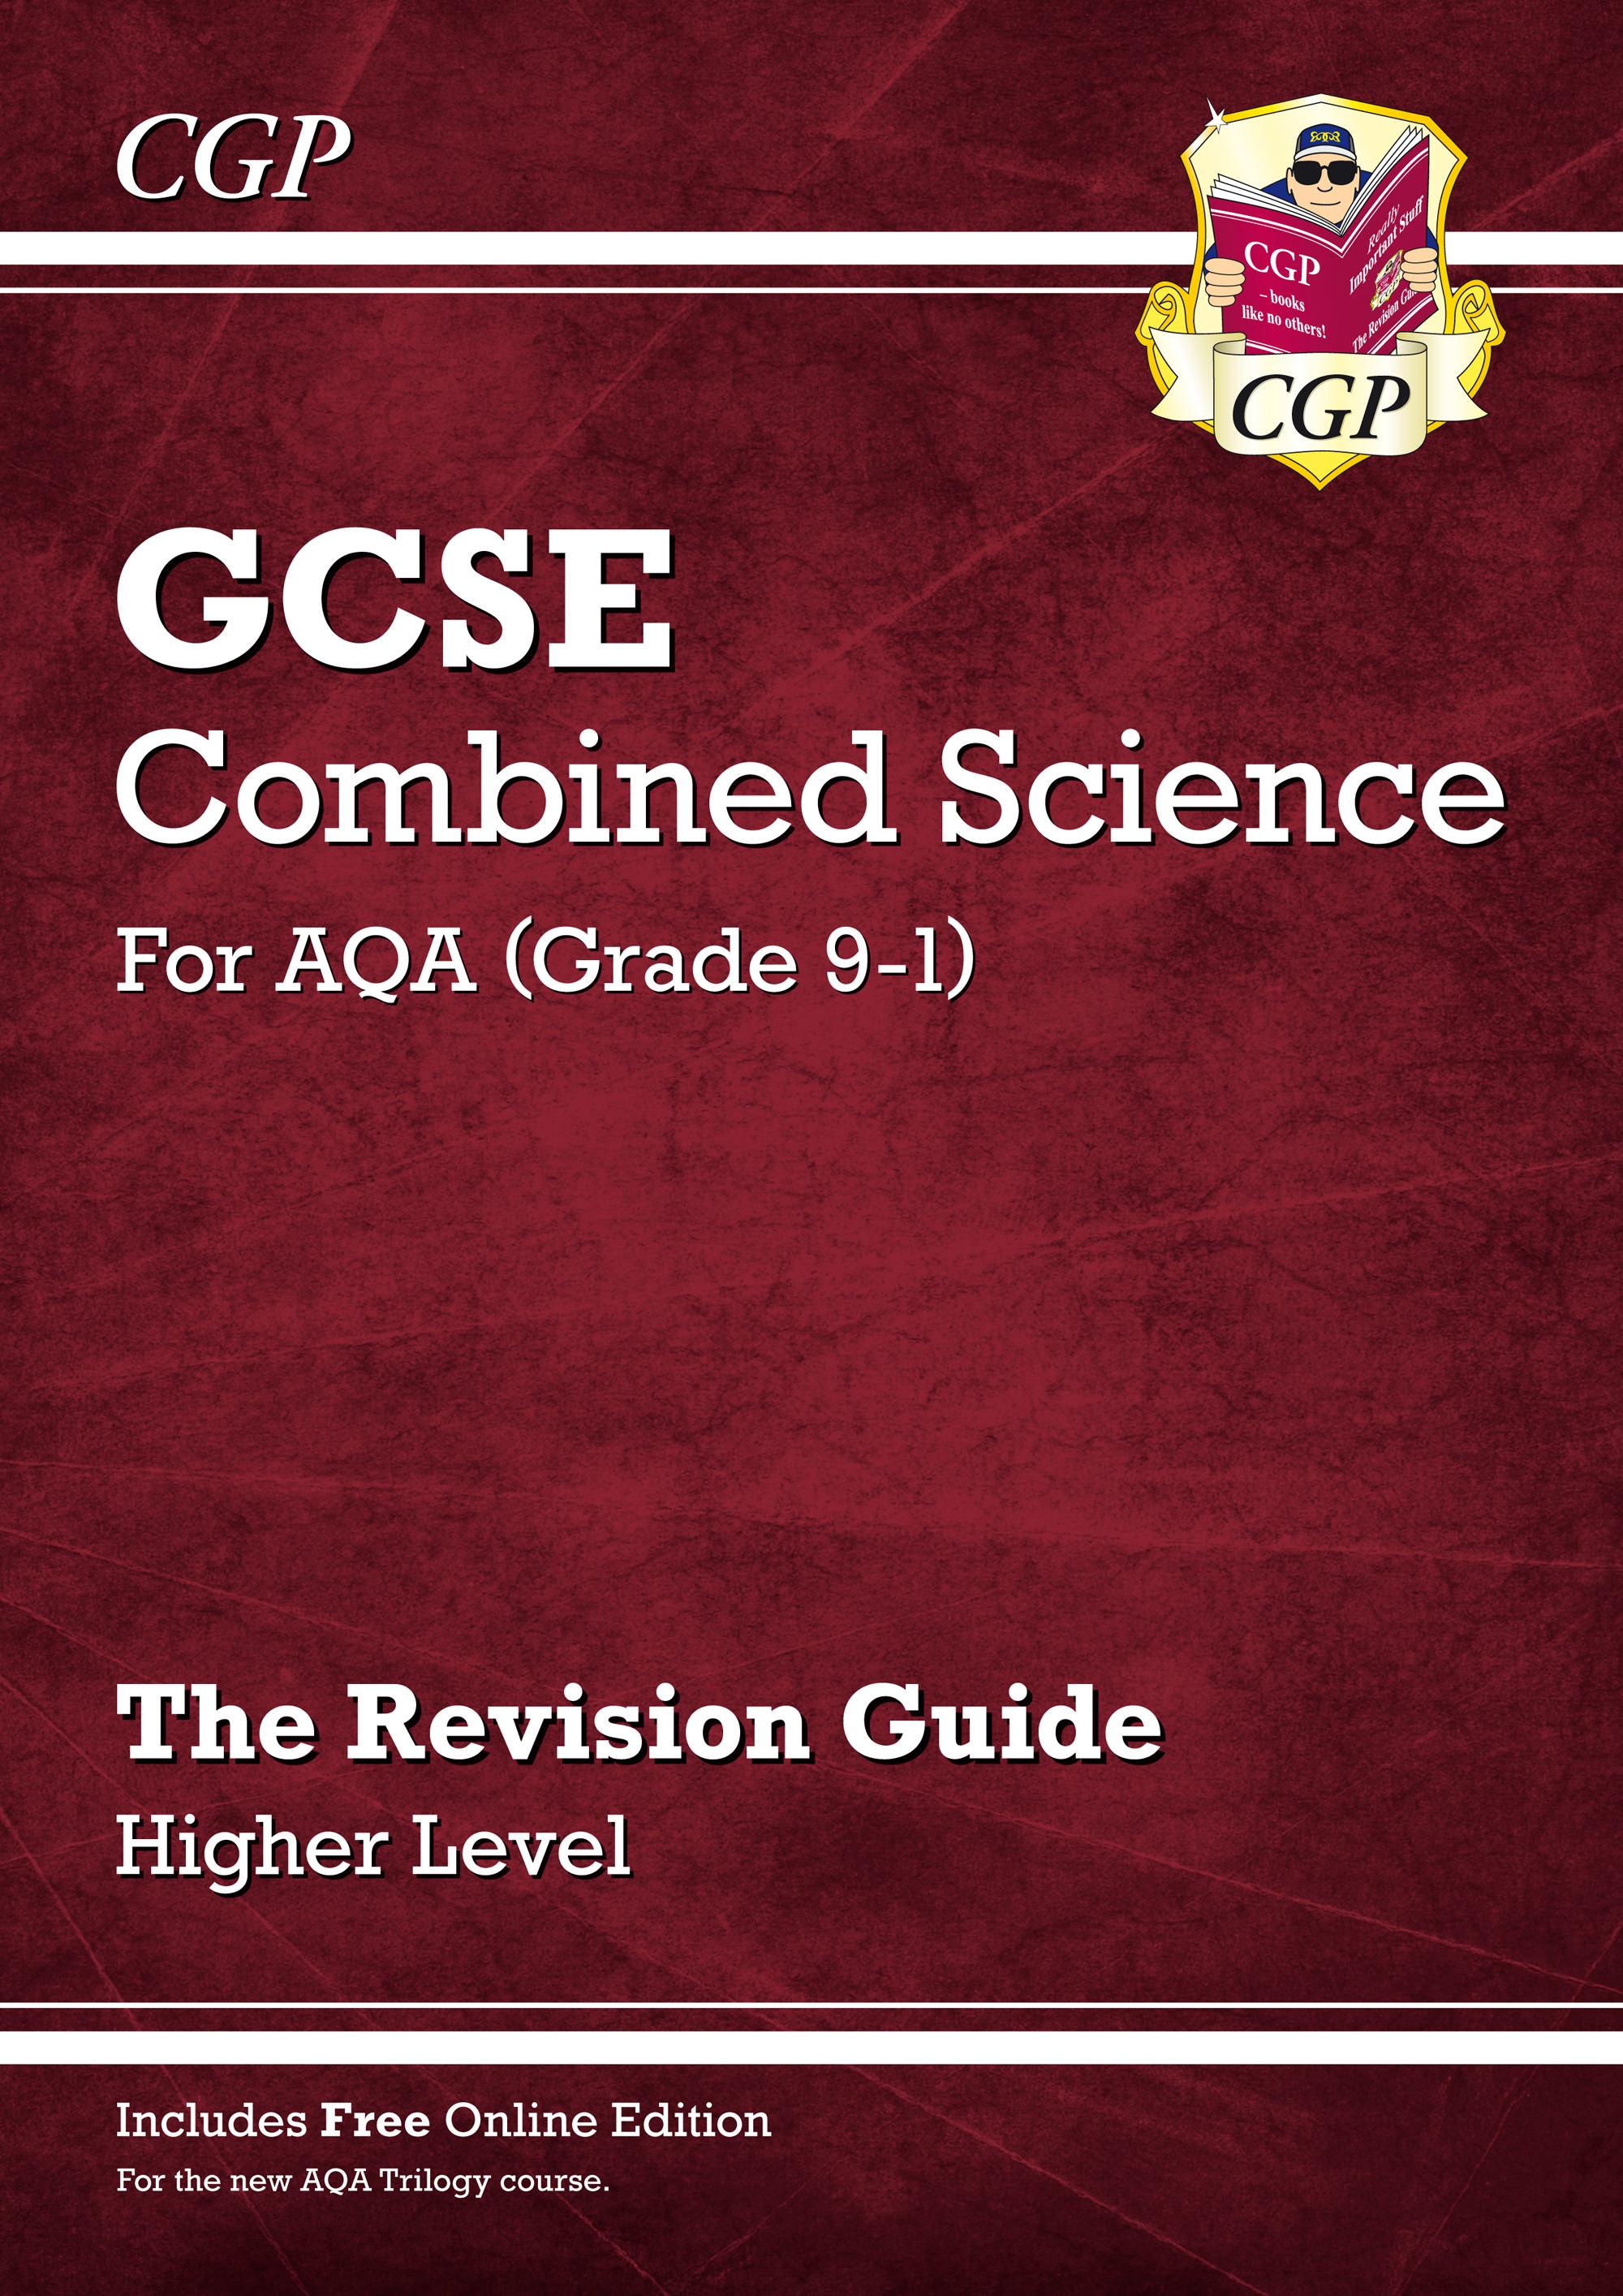 aqa gcse chemistry revision guide pdf